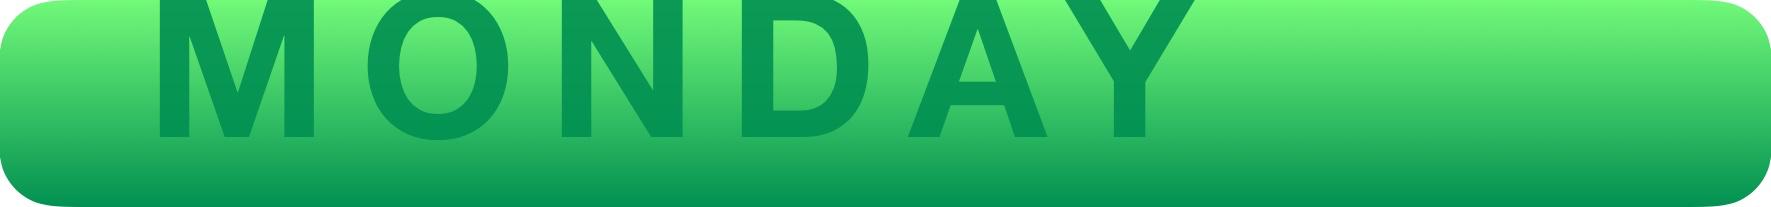 monday-button-aa